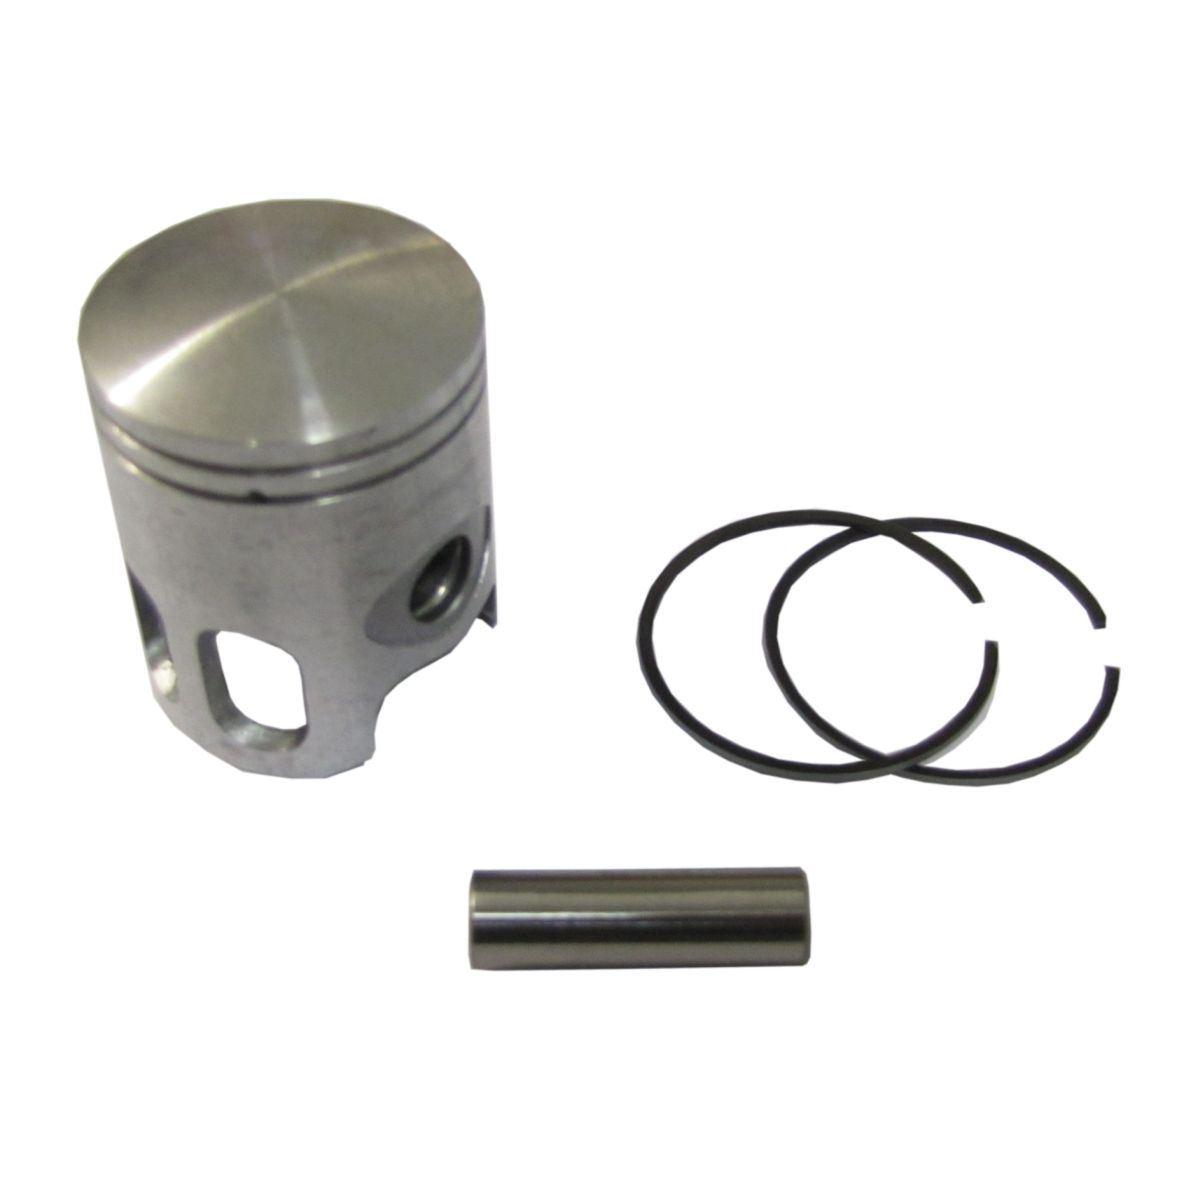 CPI GTR 50 2005 Standard Barrel 50 CC